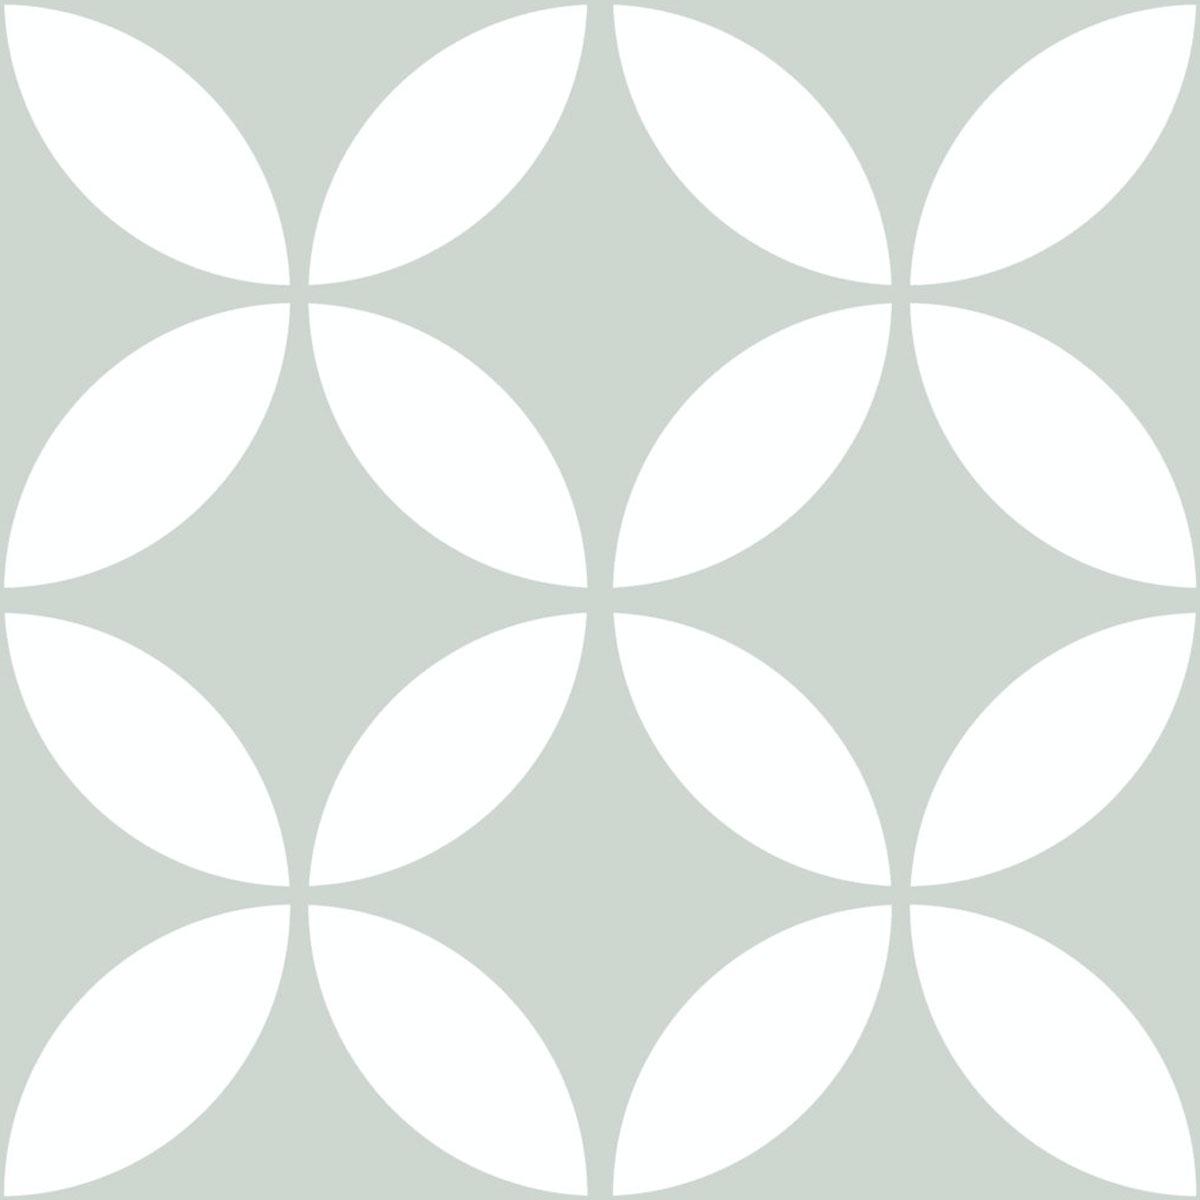 Picasso Evolution - Star Pale Green - Patterned Tiles - Stone3 Brisbane